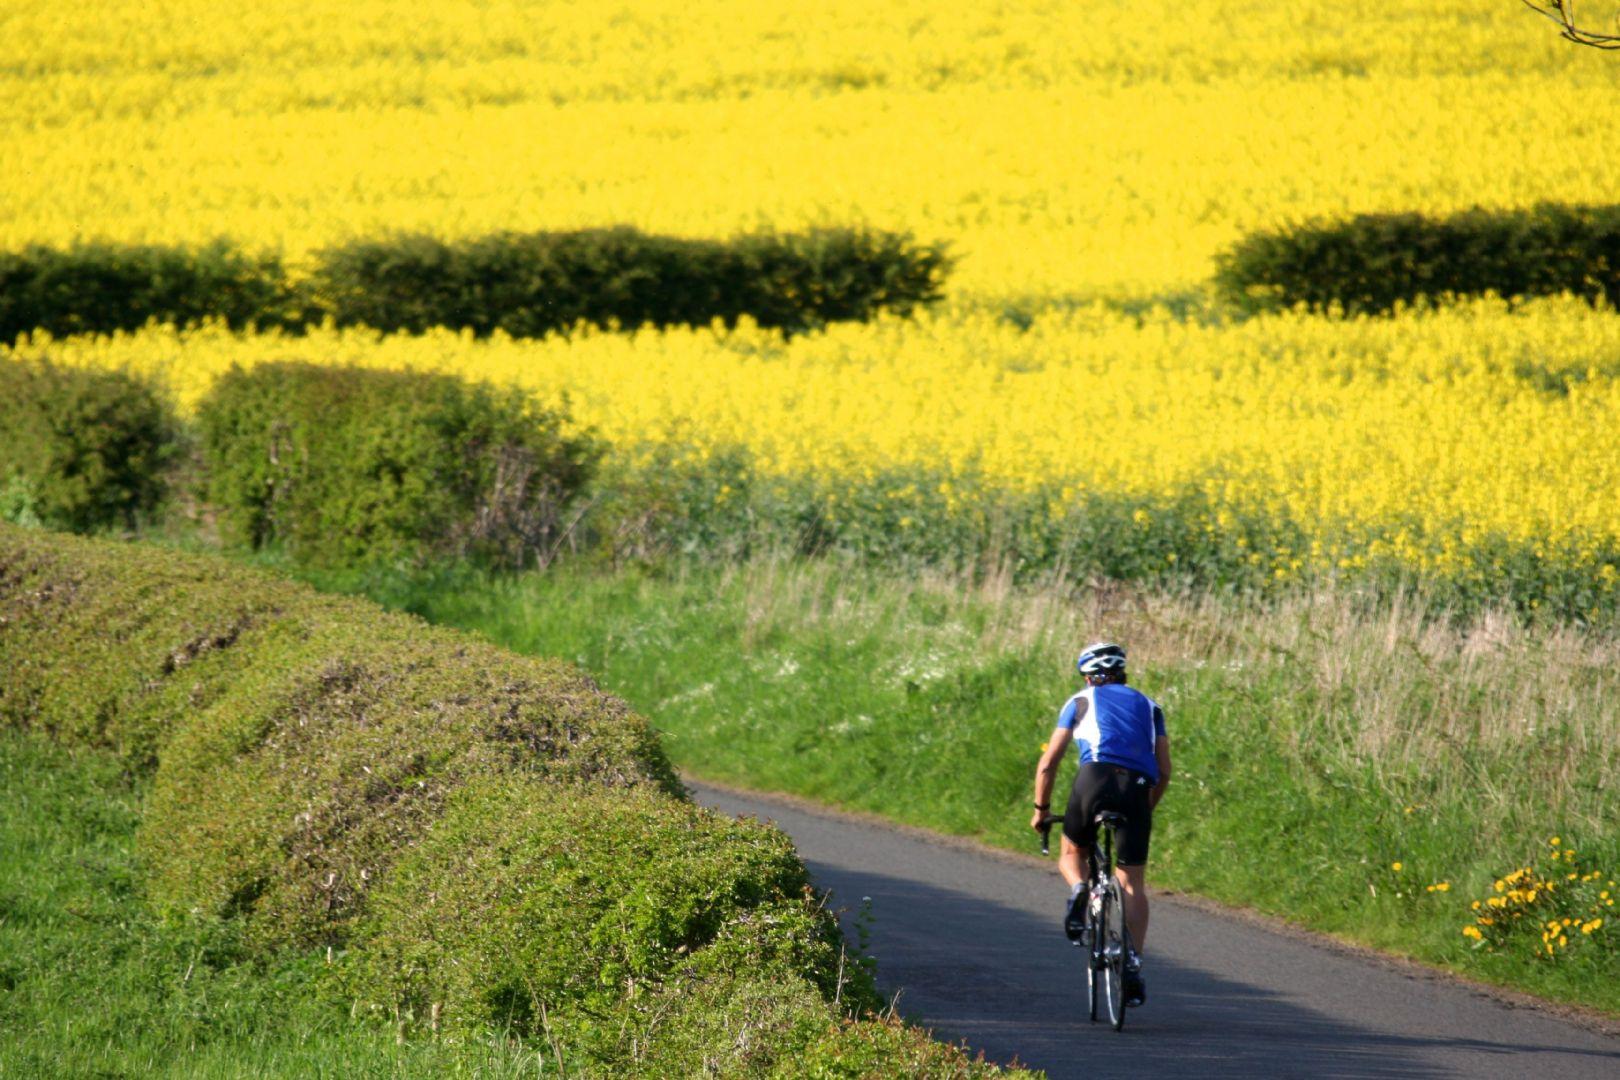 Northumberland Road Cycling Weekend 32.JPG - UK - C2C - Coast to Coast 2 Days Cycling - Self-Guided Road Cycling Holiday - Road Cycling